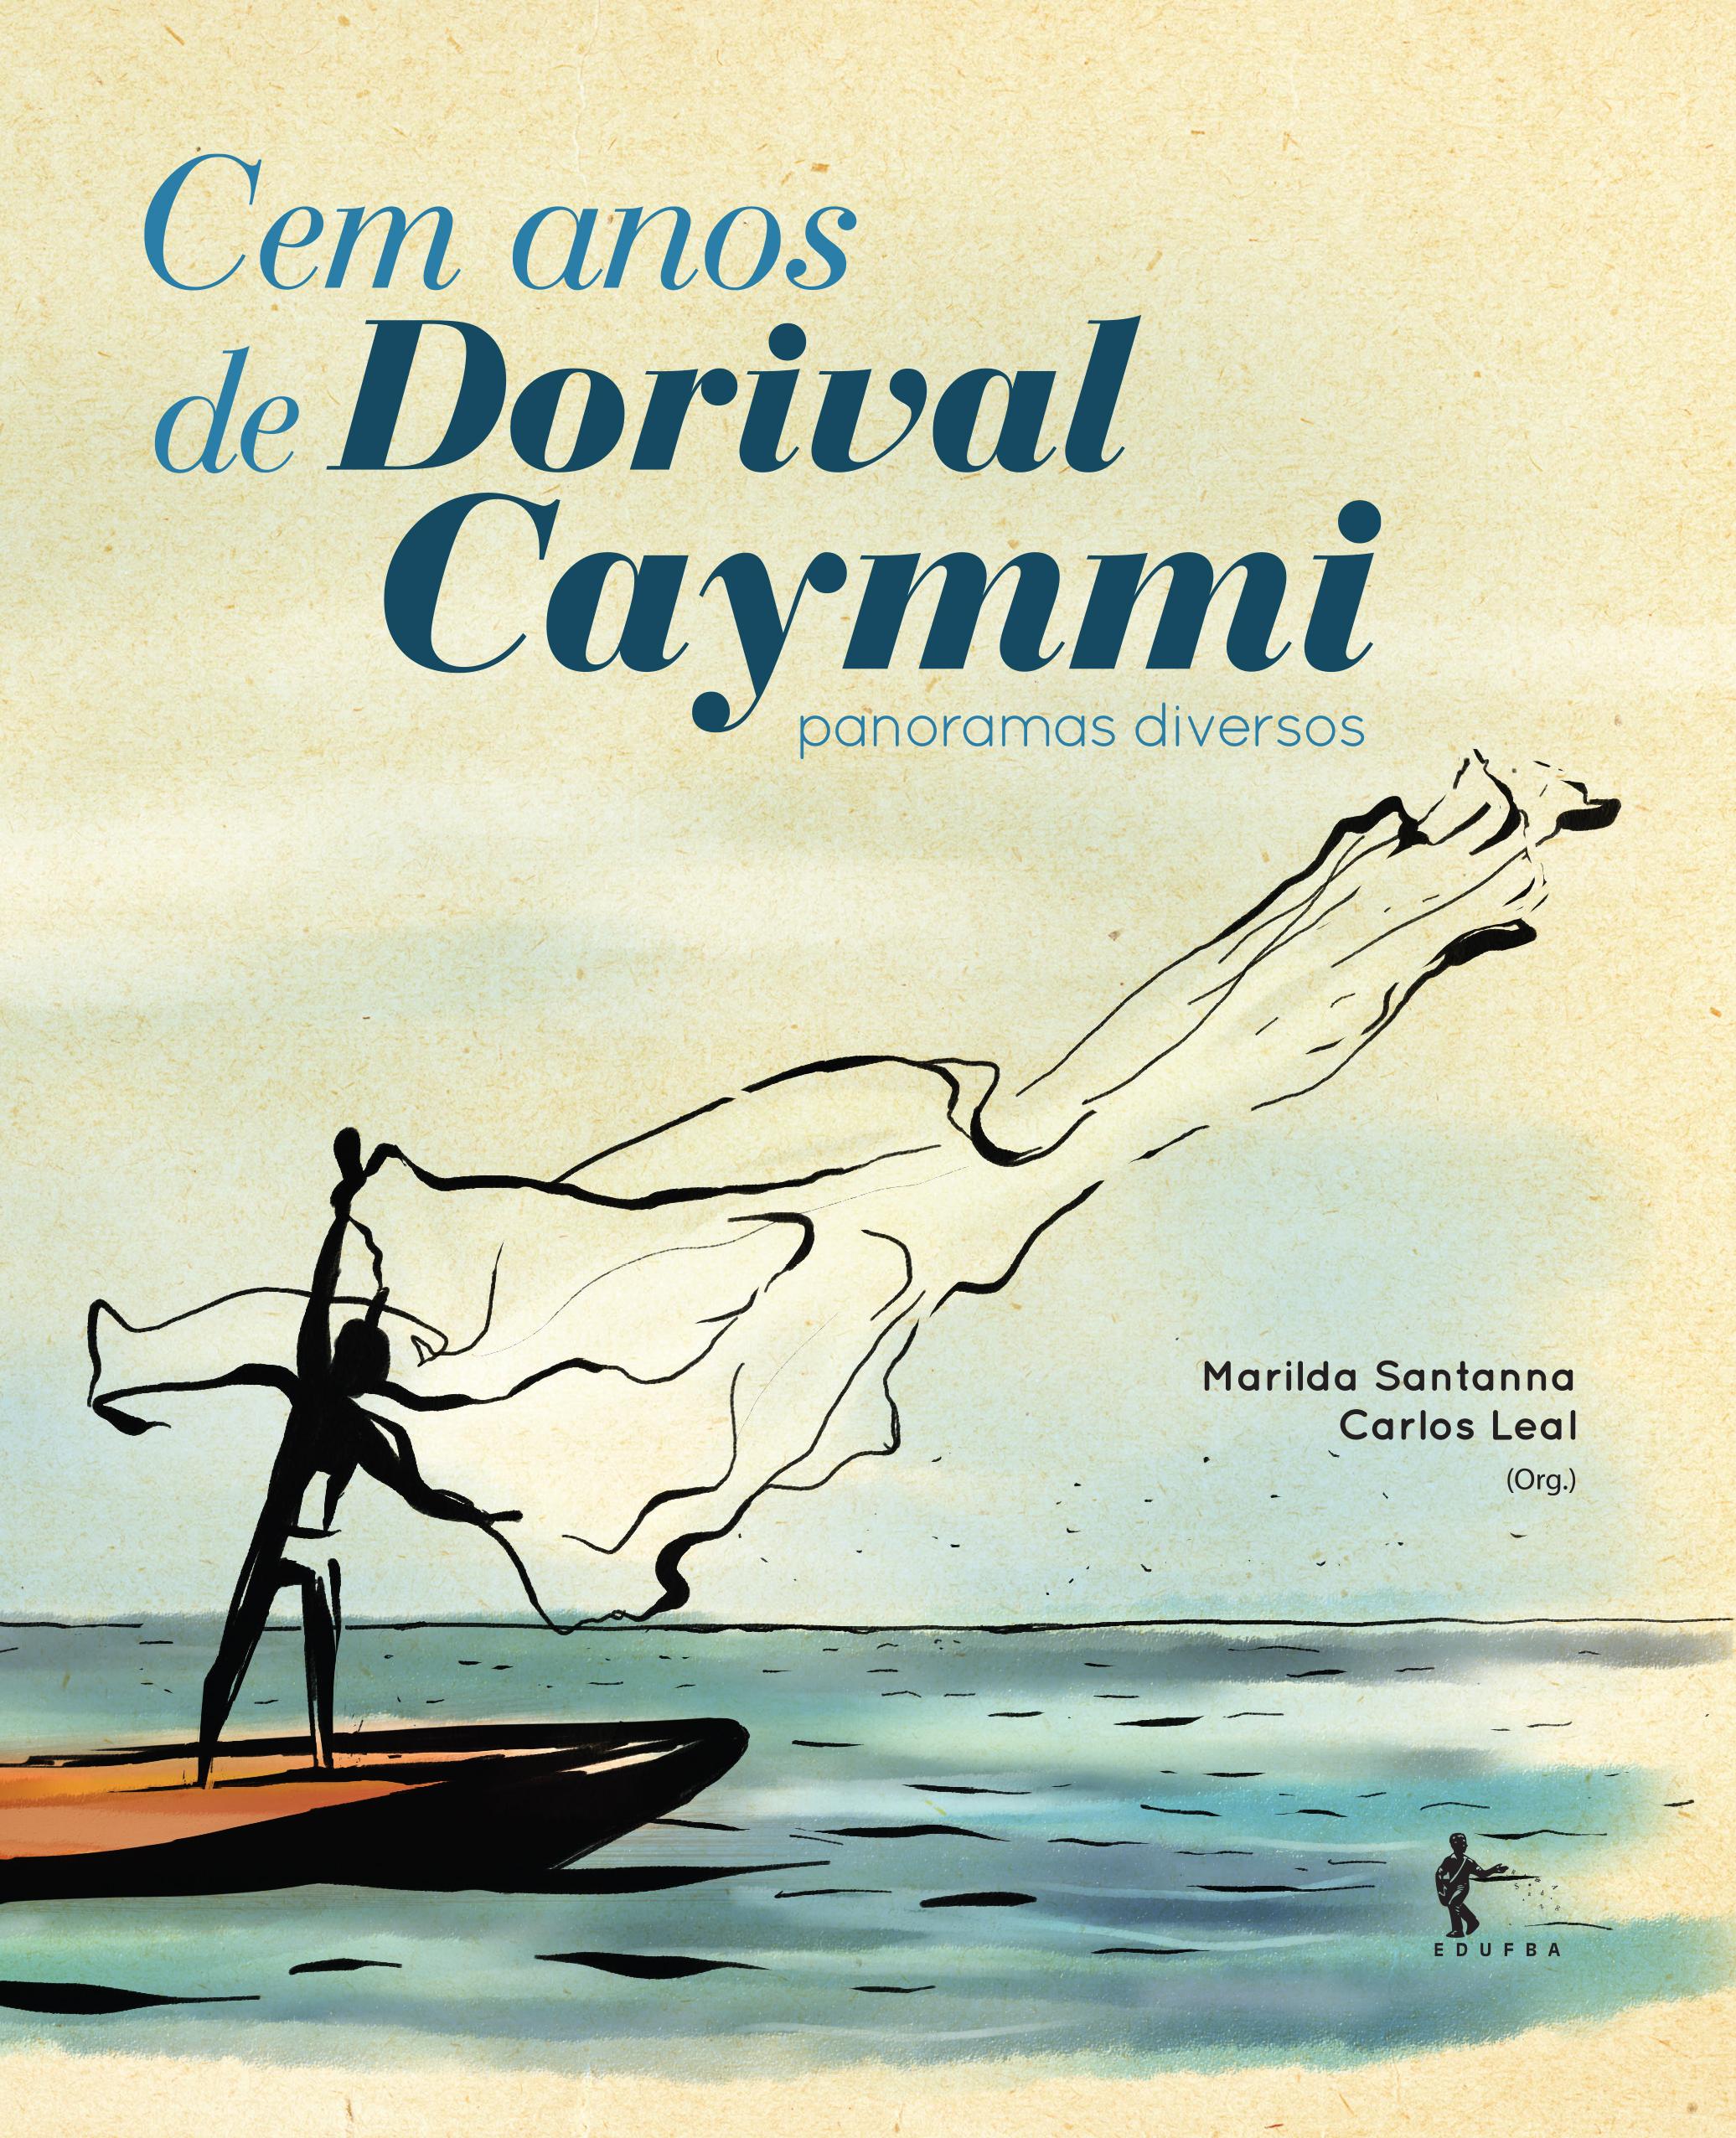 Cem anos de Dorival Caymmi: panoramas diversos, livro de Marilda Santanna, Carlos Leal (orgs.)